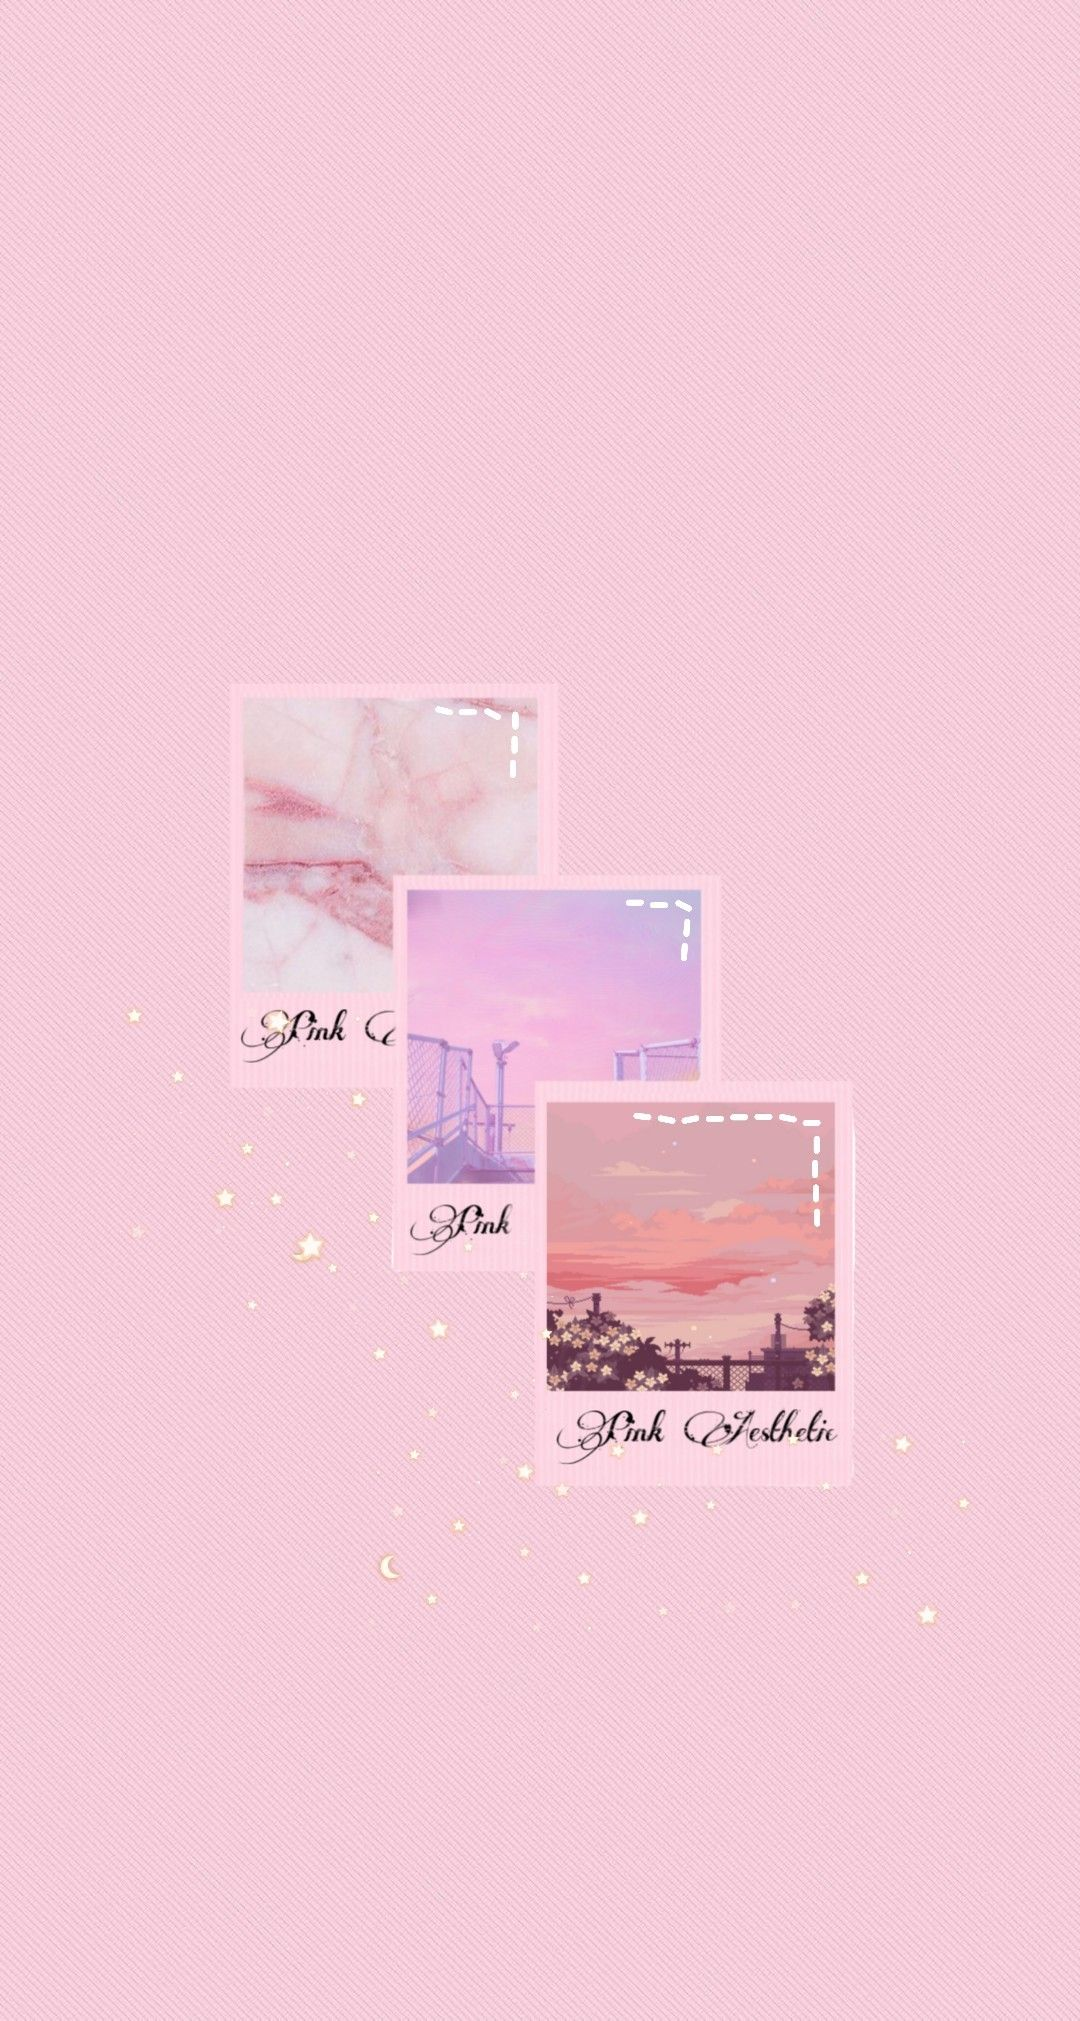 Pastel Pink Aesthetic Wallpaper Fondos De Pantalla De Iphone Pantalla De Iphone Fondos De Pantalla